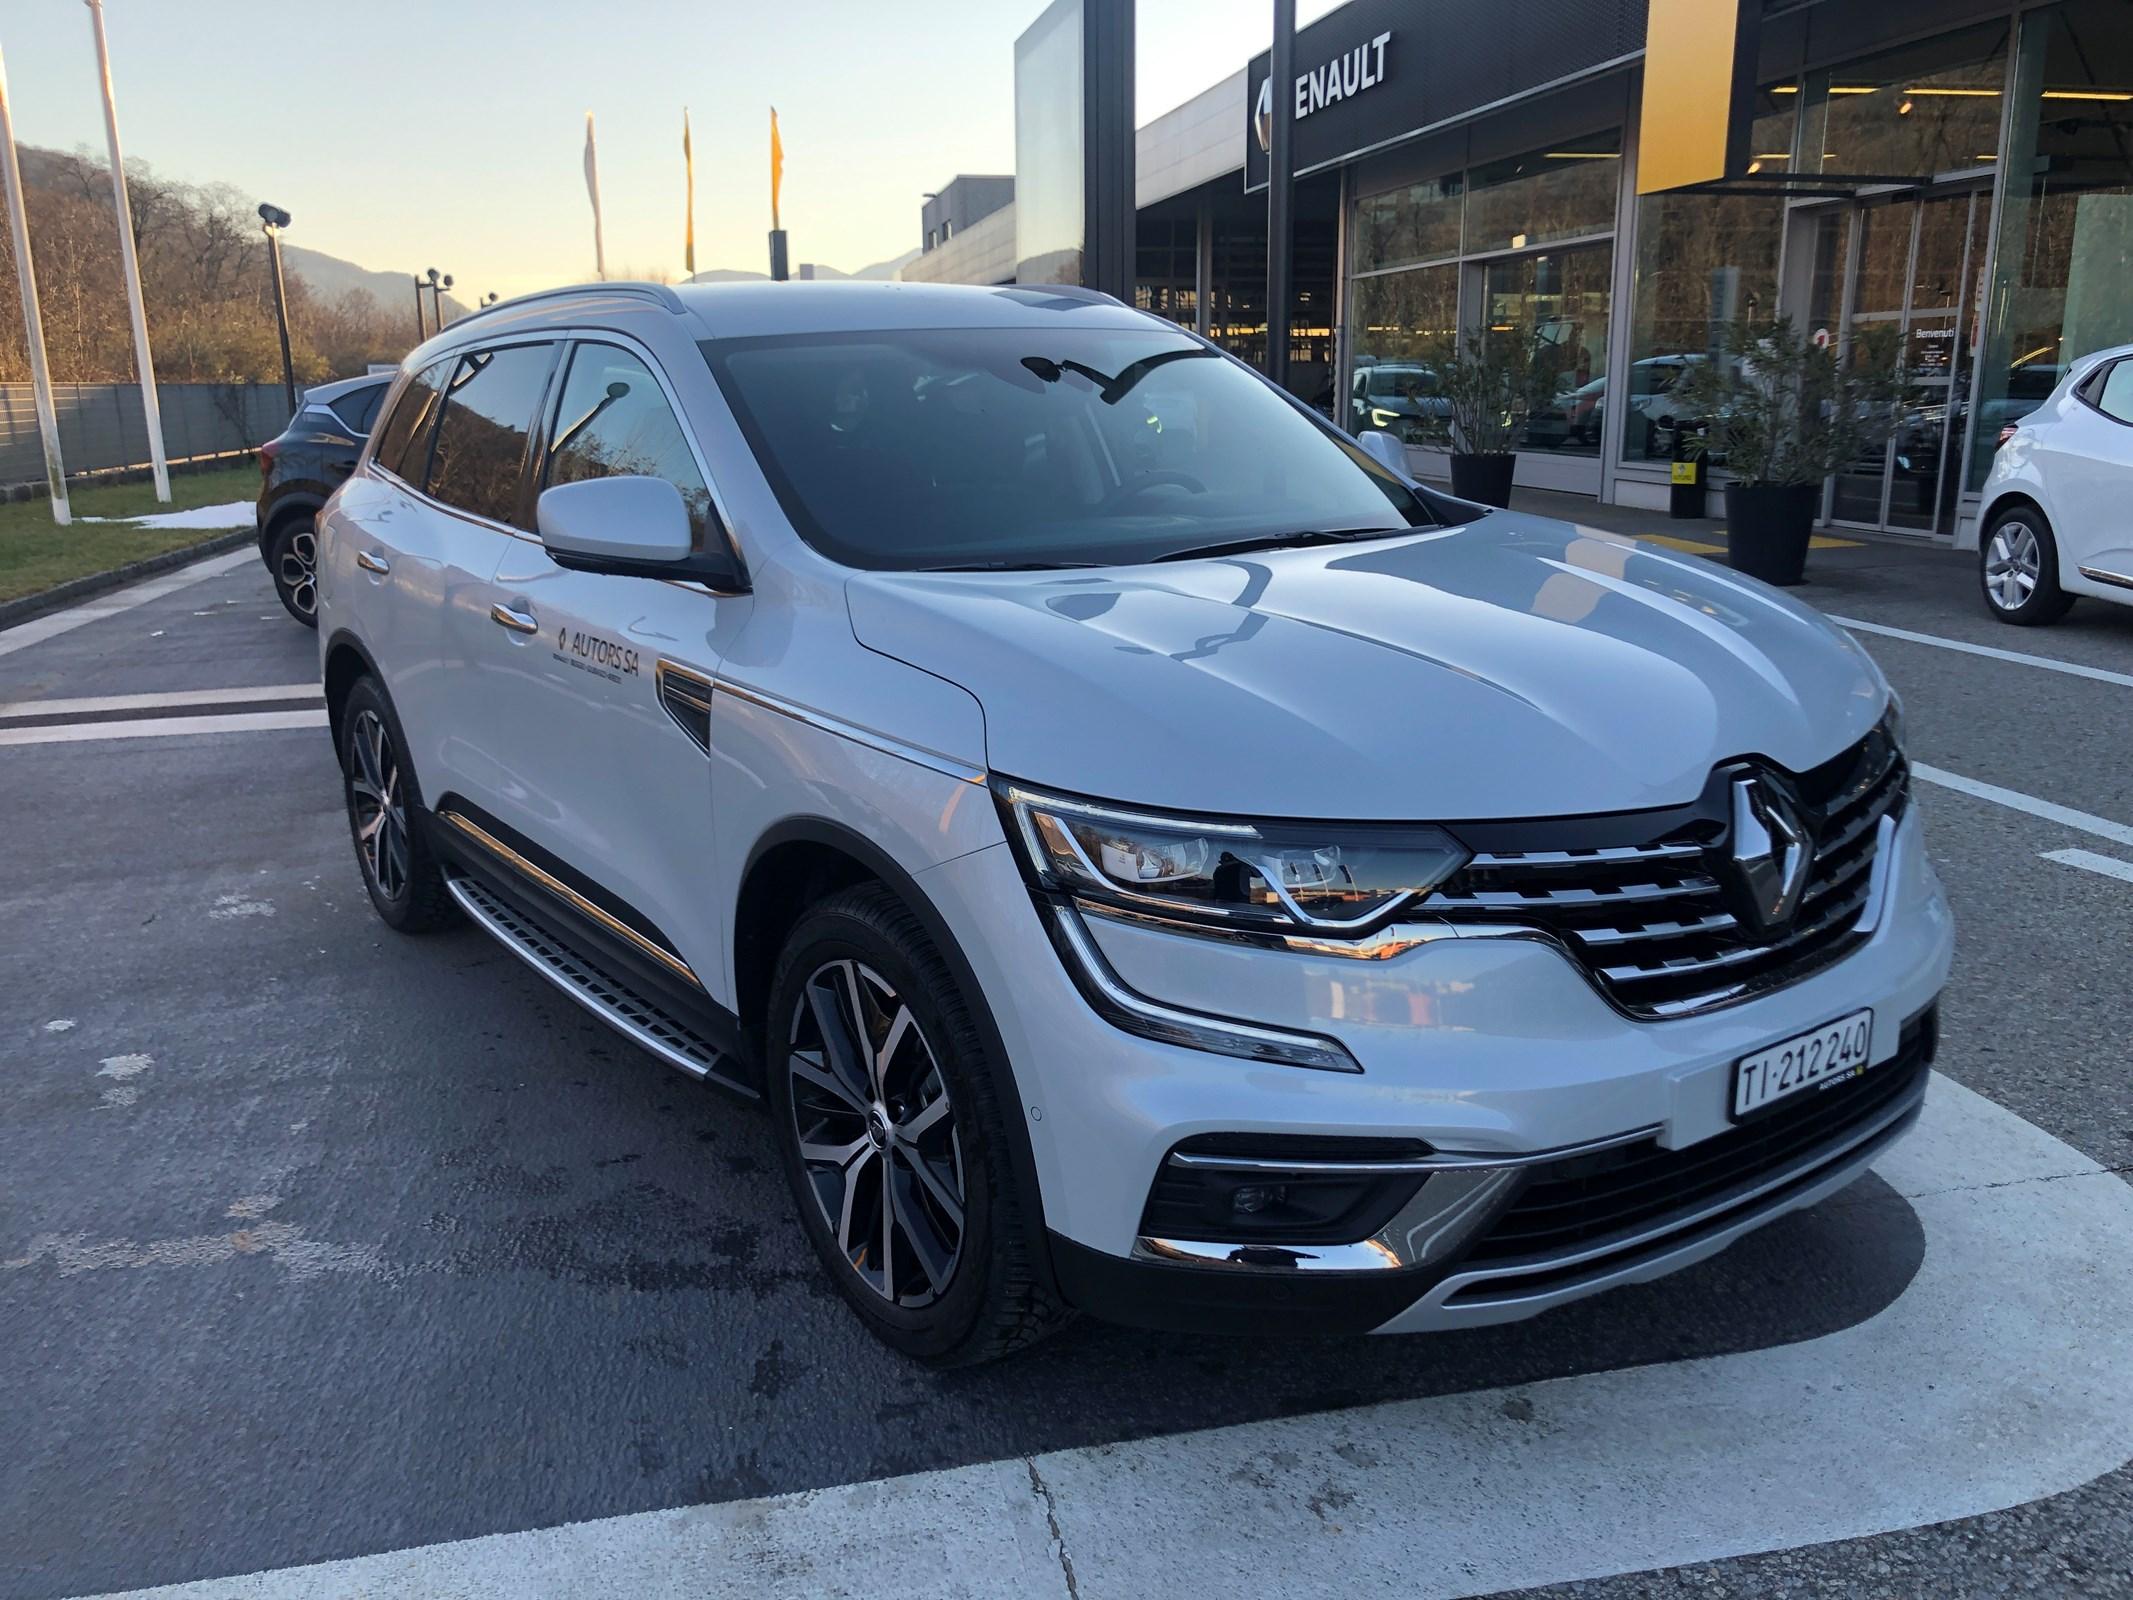 suv Renault Koleos 2.0 dCi Intens 4WD Xtronic CVT